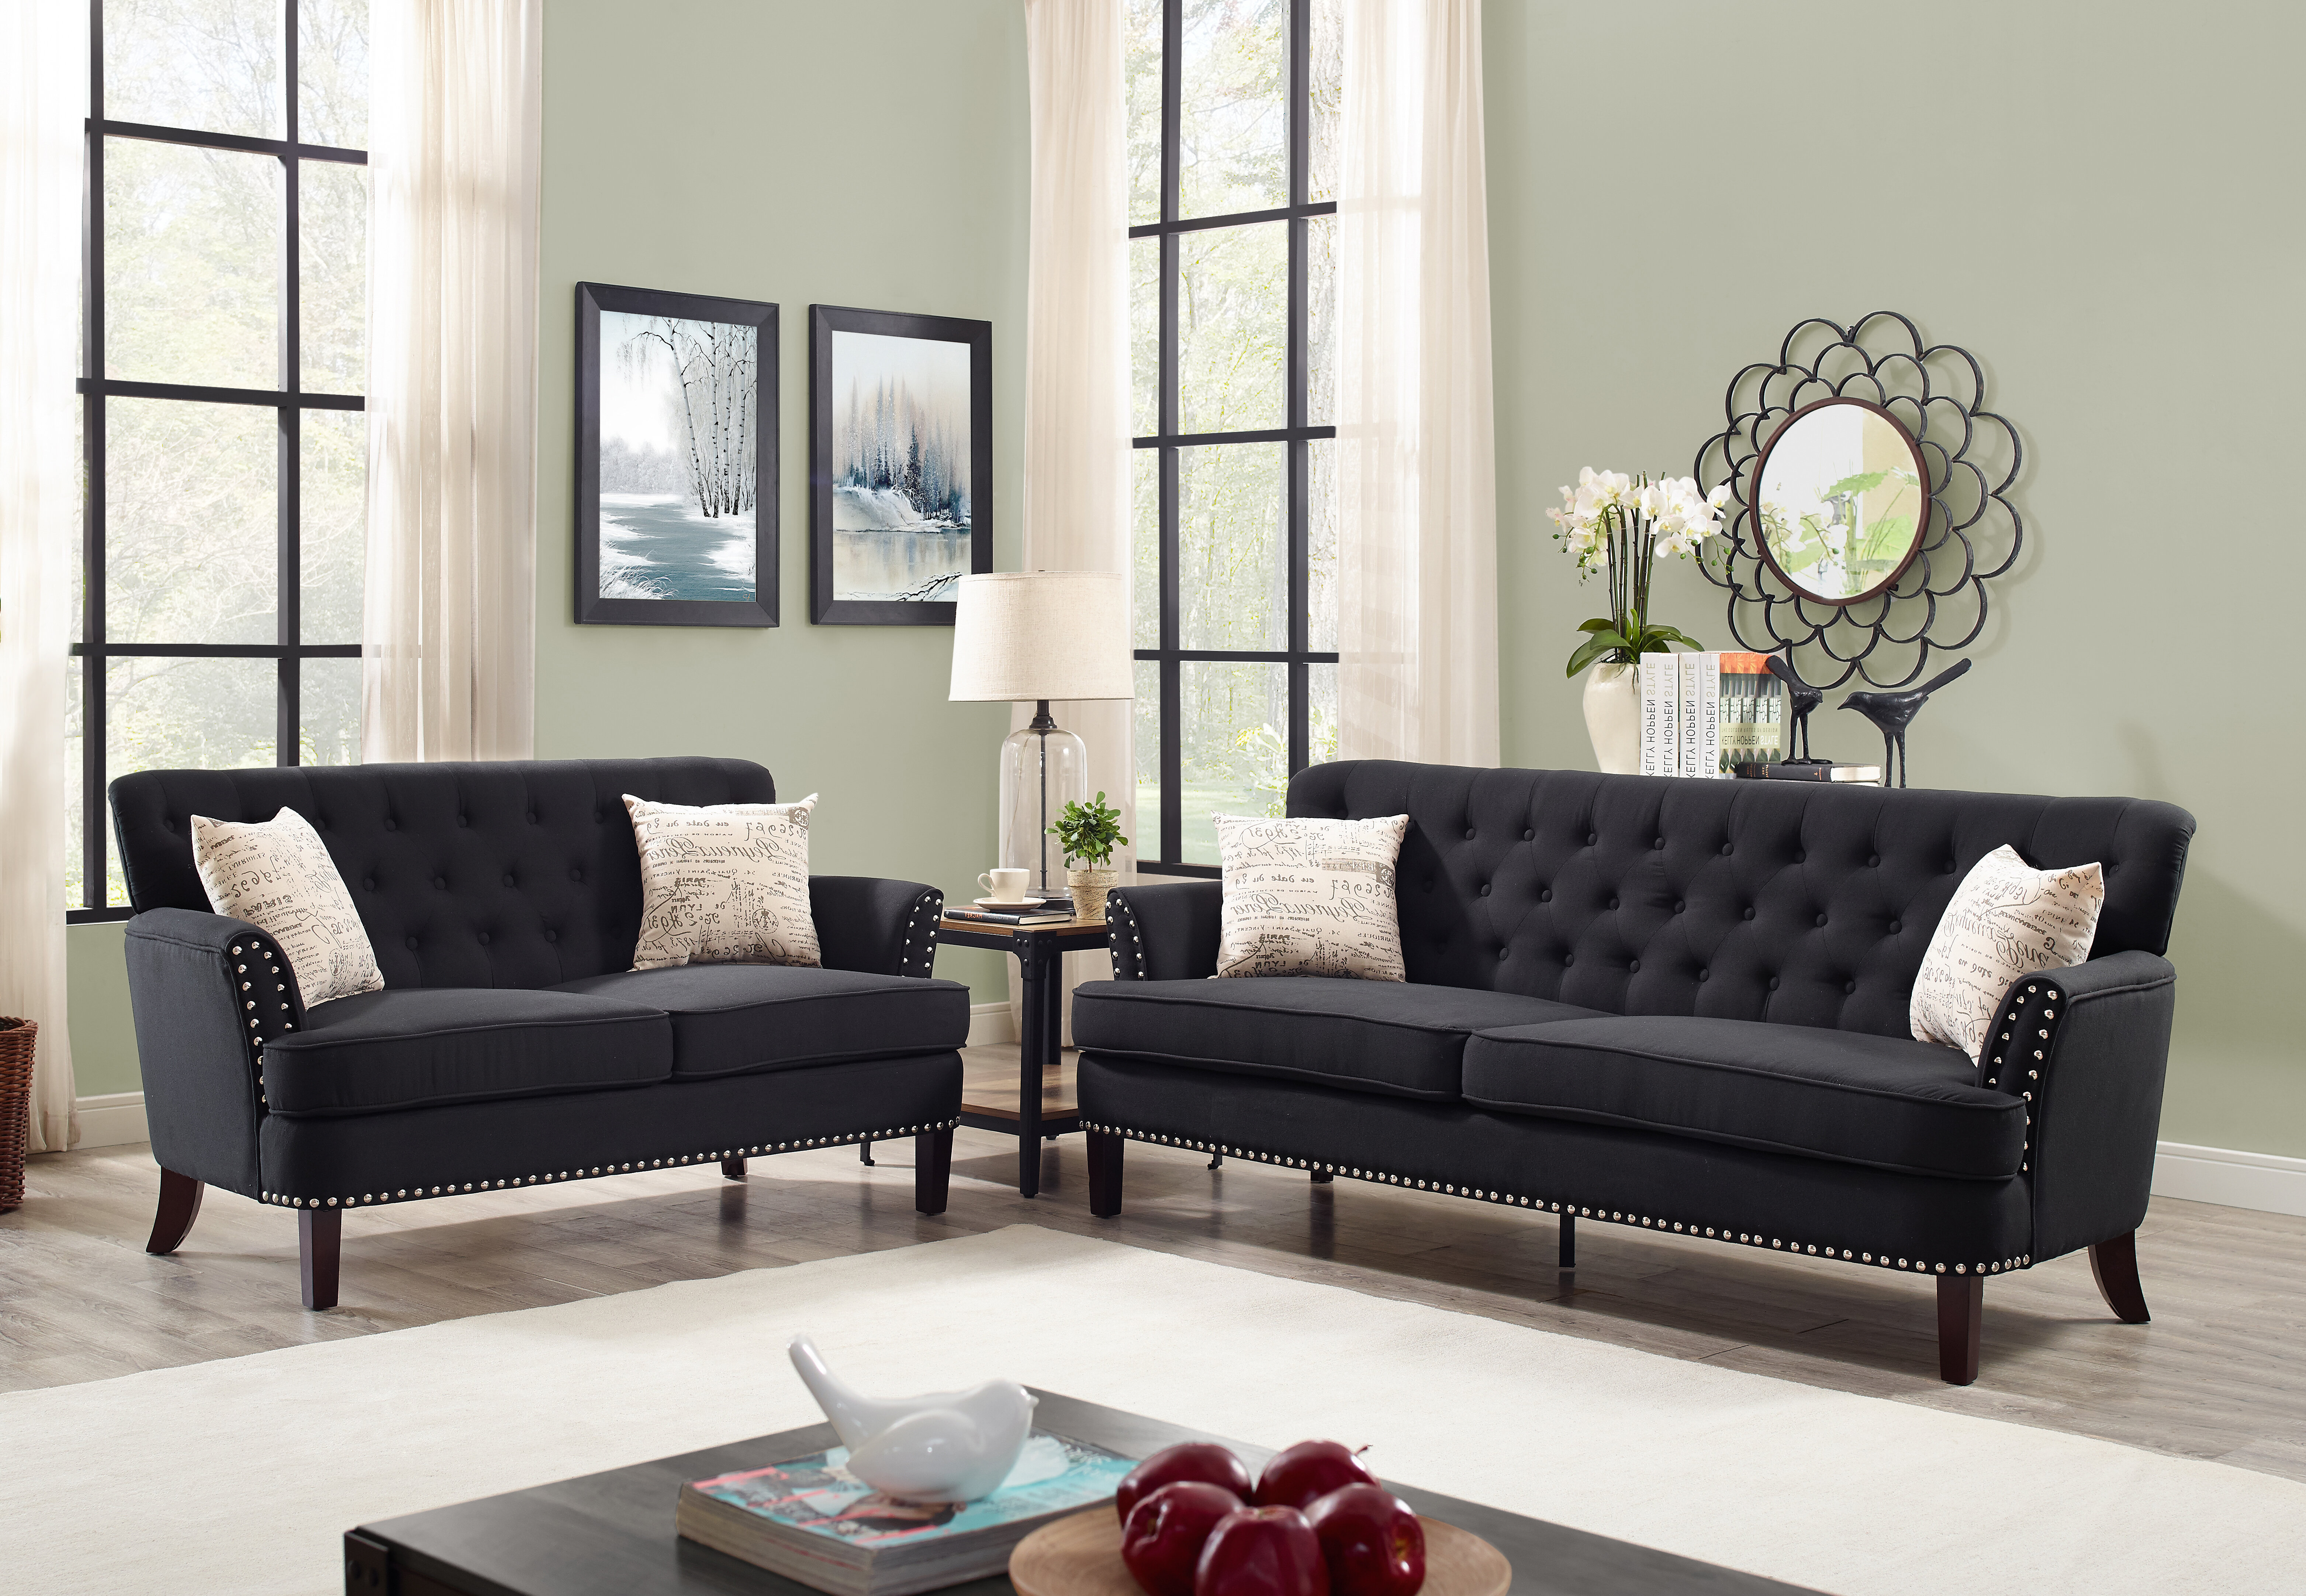 Canora grey quayle wing chesterfield nailhead 2 piece living room set wayfair ca